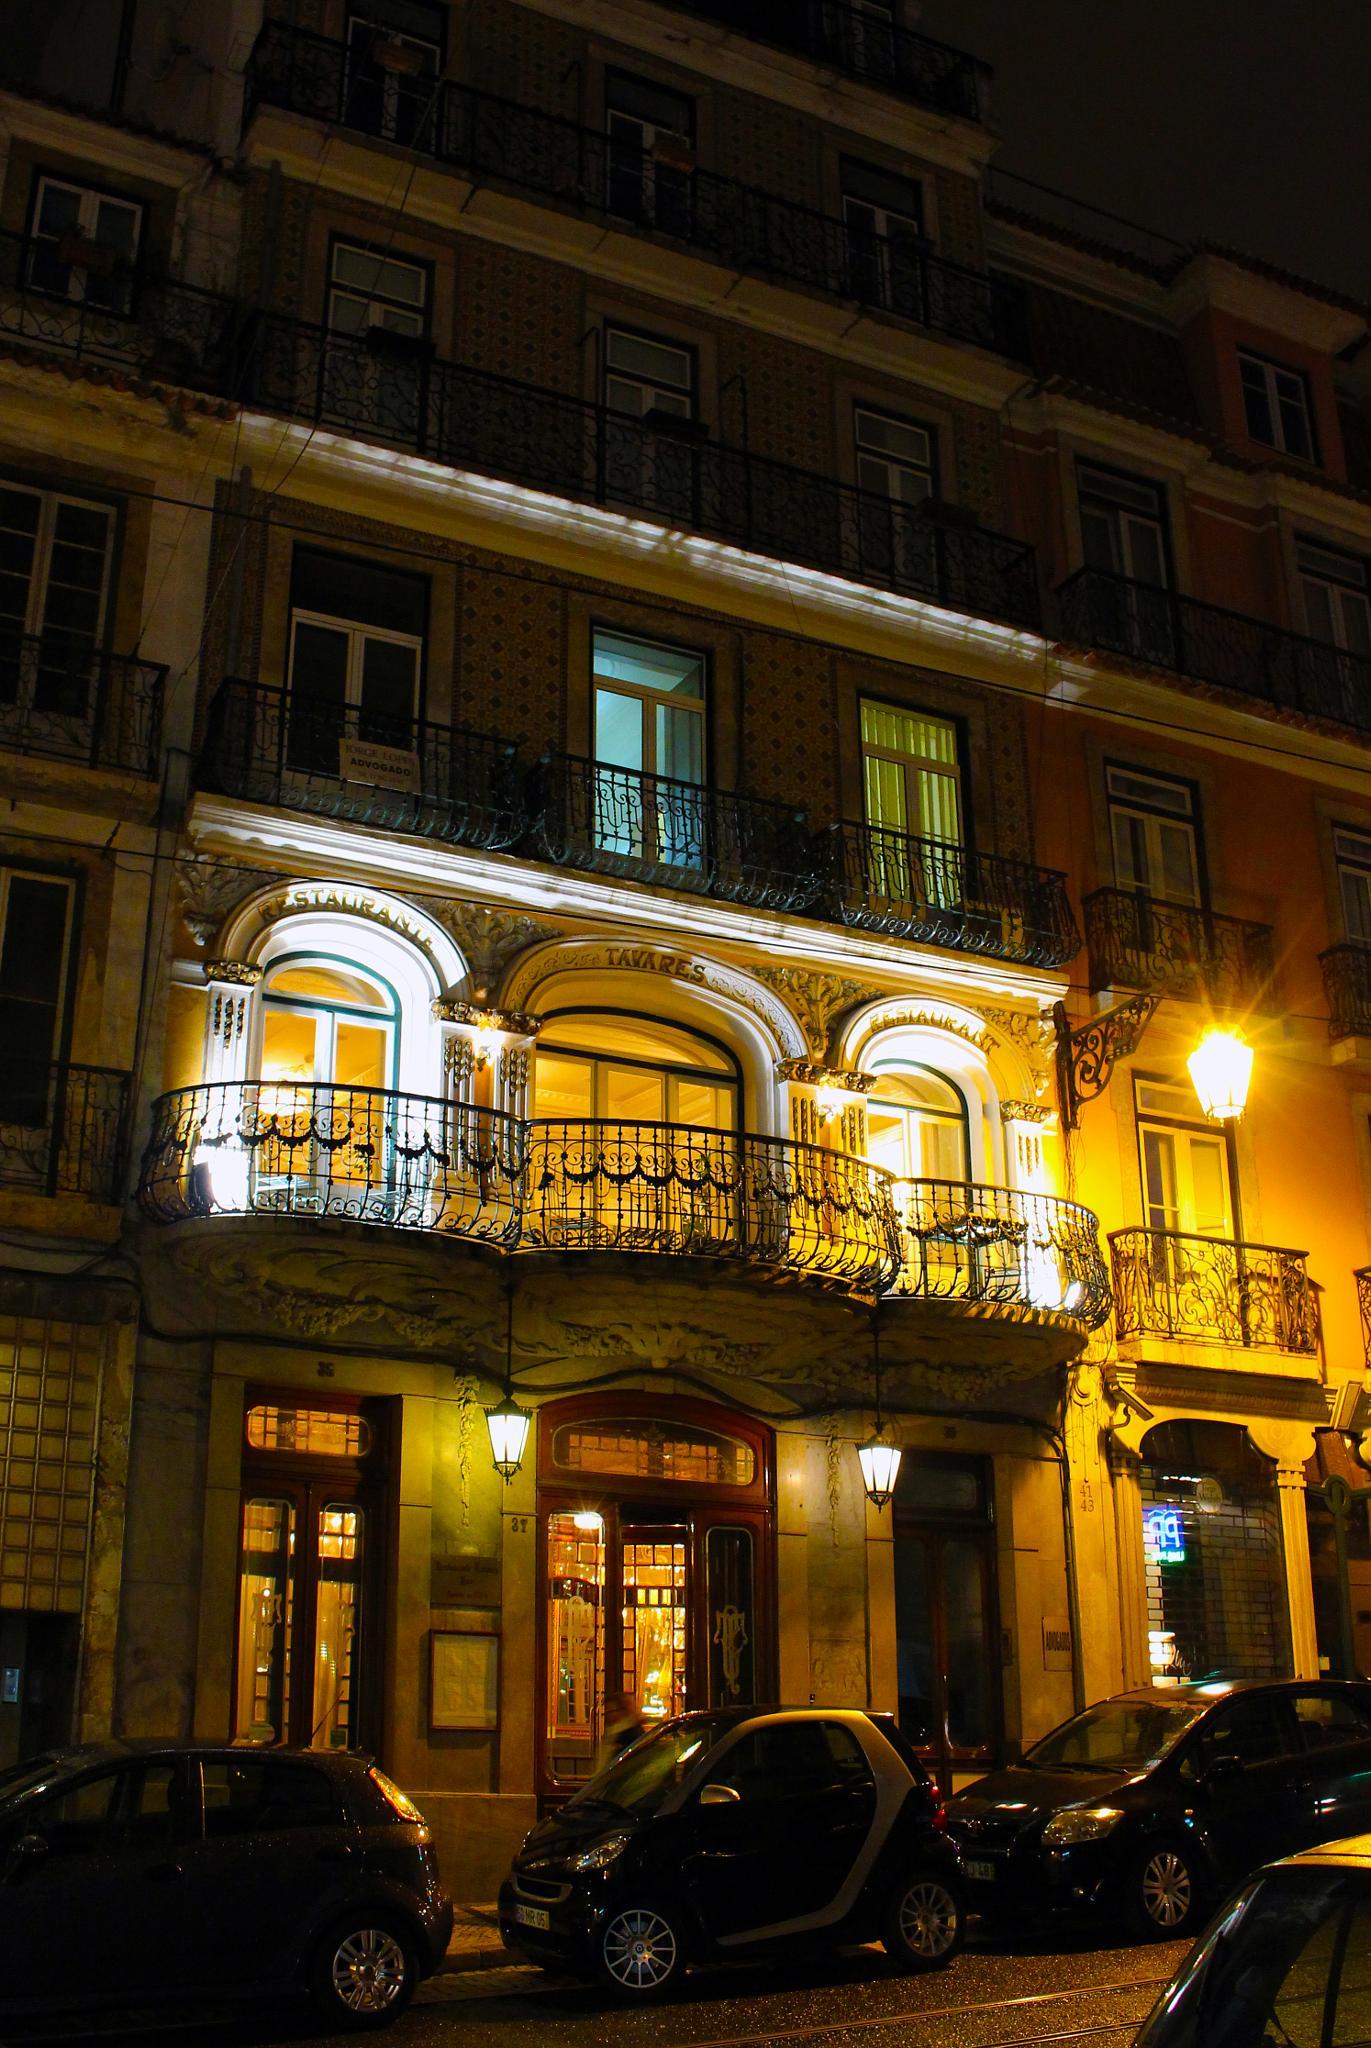 Tavares Restaurant, Chiado, Lisbon by carlosmsantos